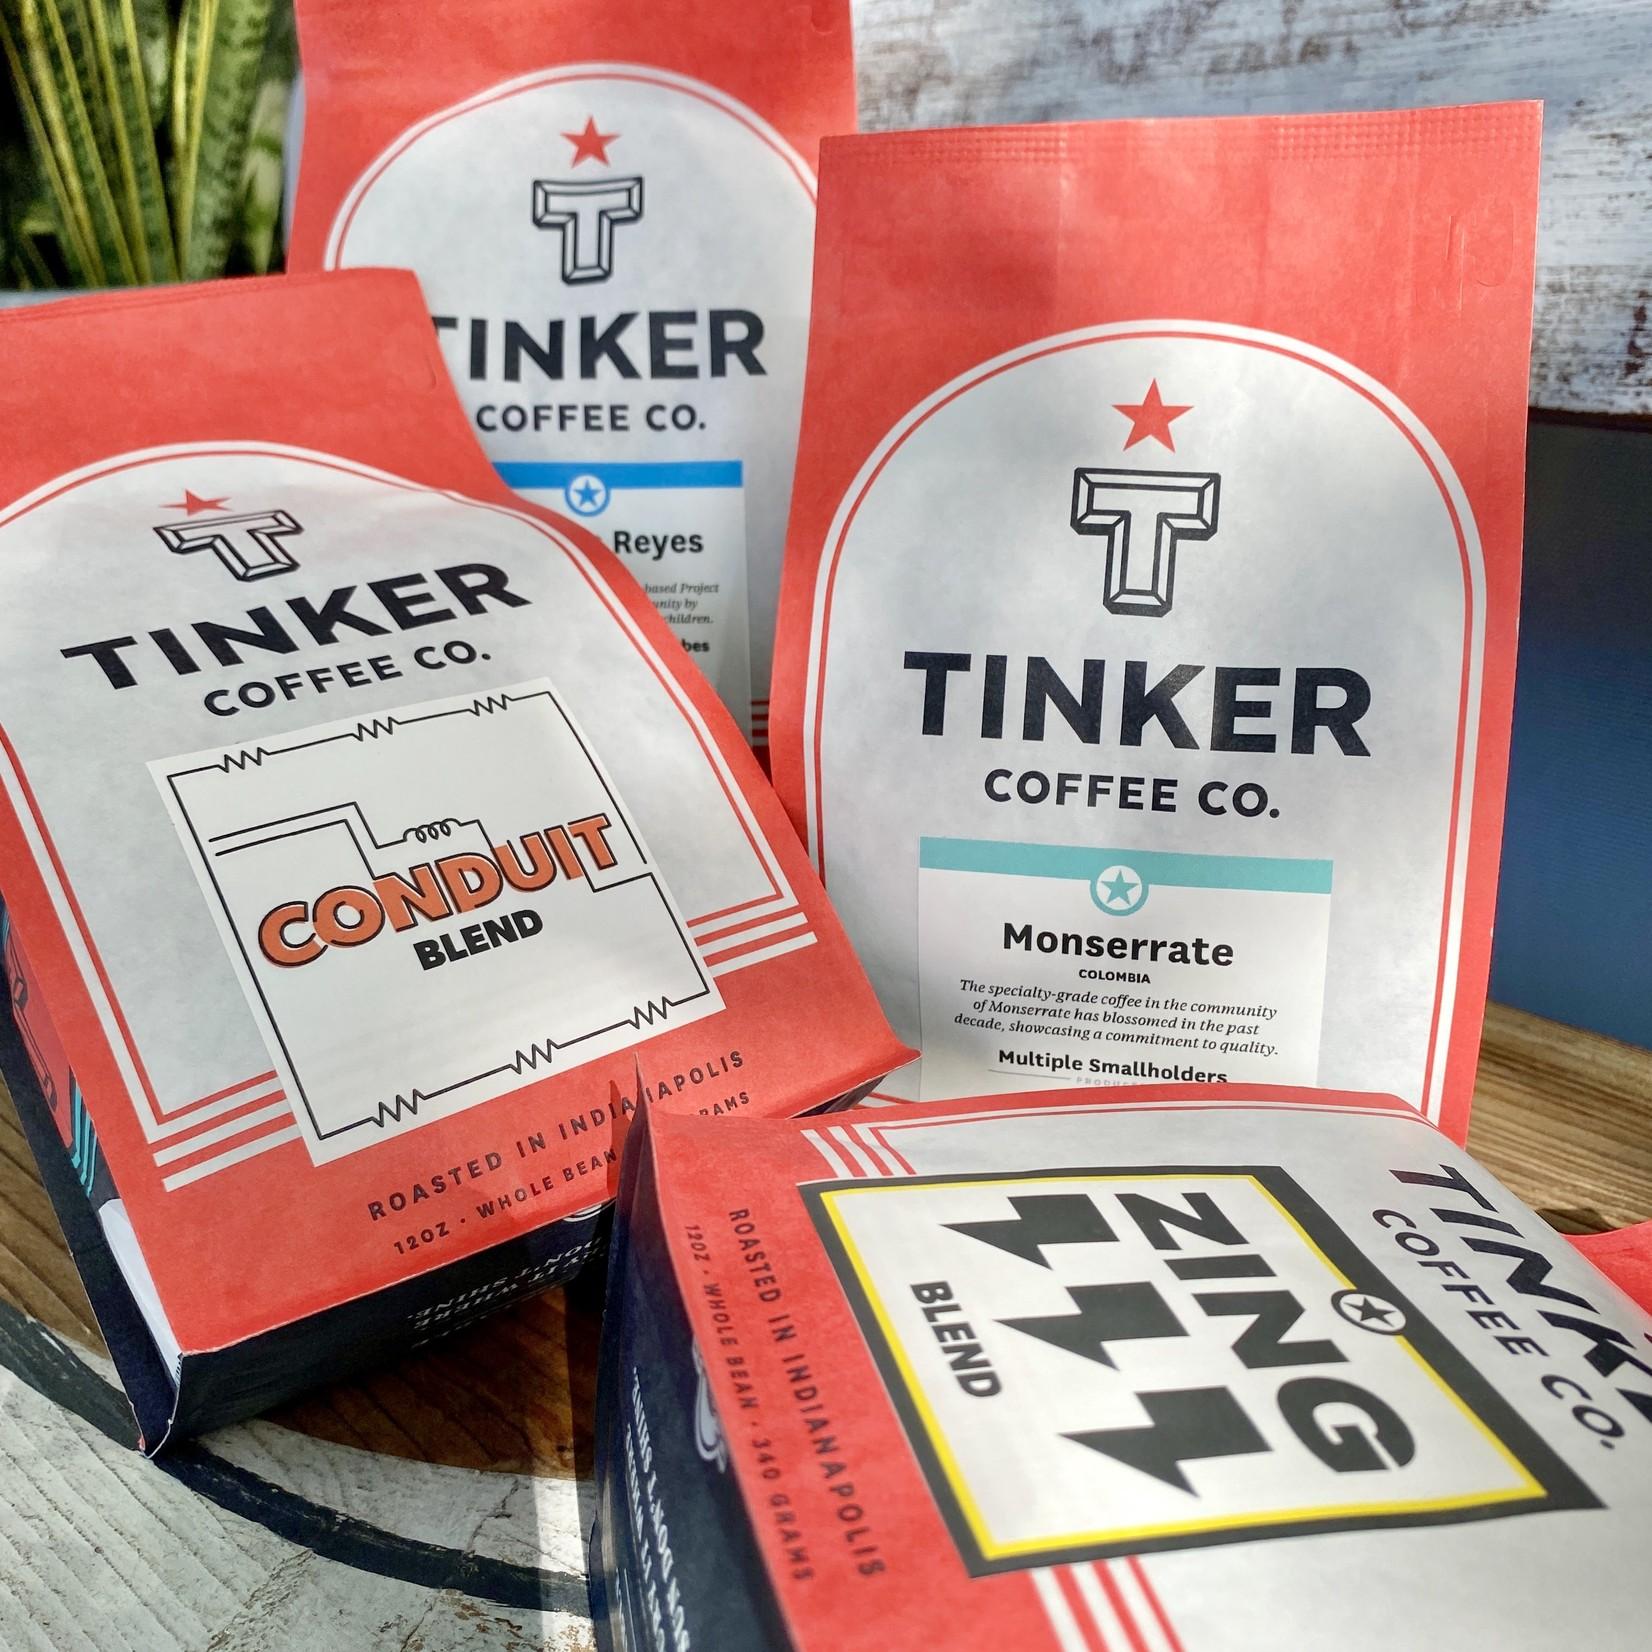 Tinker Coffee Co. Whole Bean Coffee 12oz. Bags